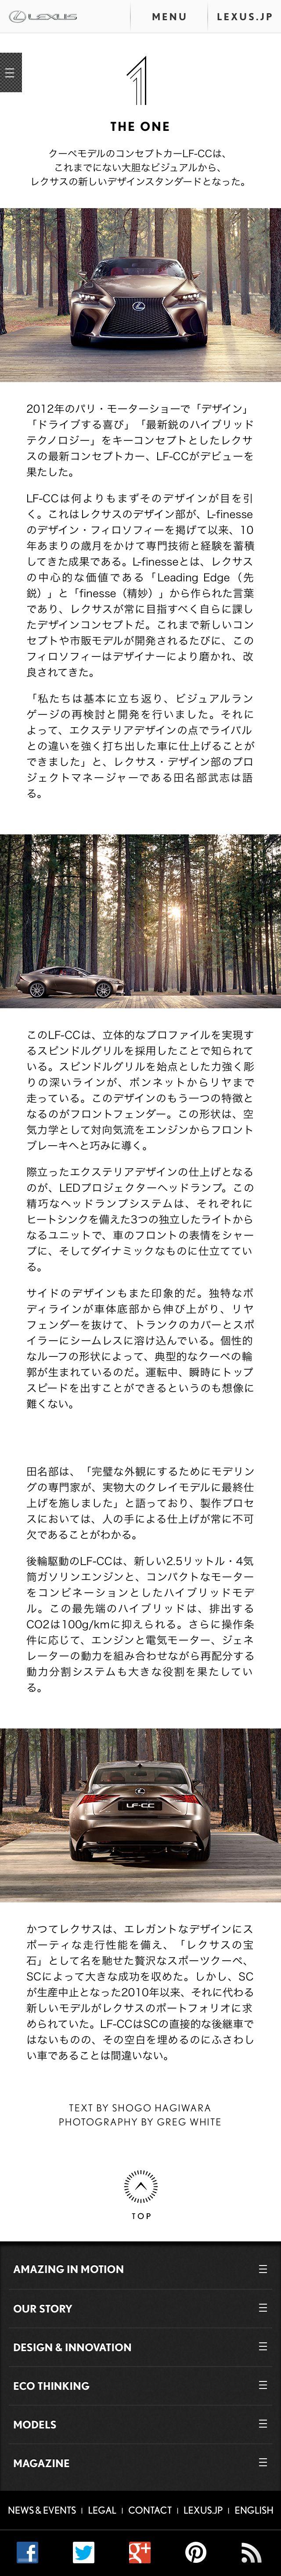 http://www.lexus-int.com/jp/magazine/smp/issue1/one/